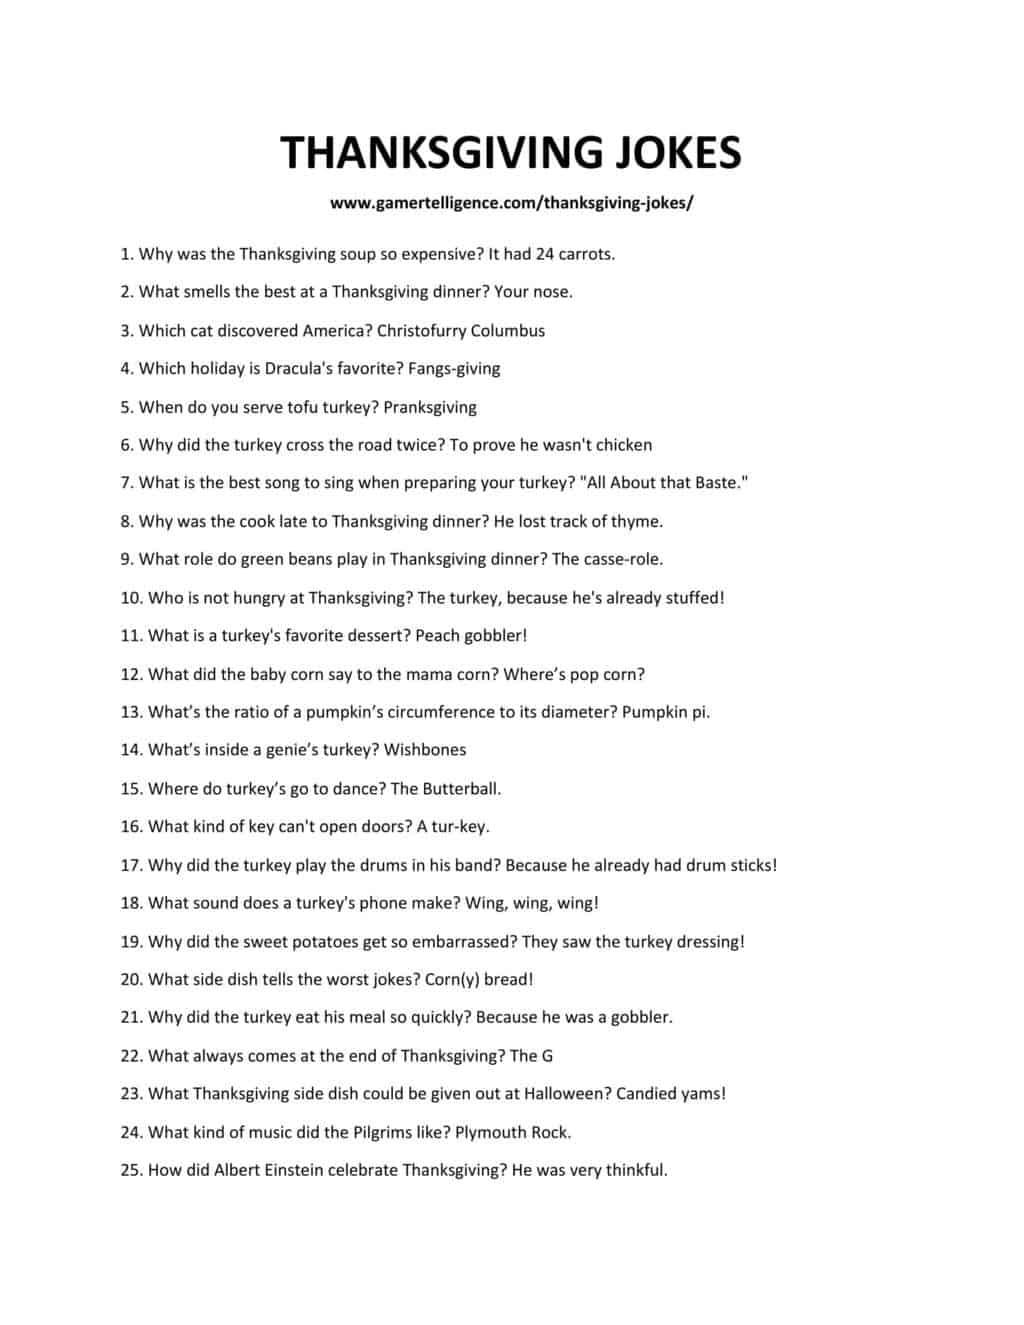 Downloadable list of jokes